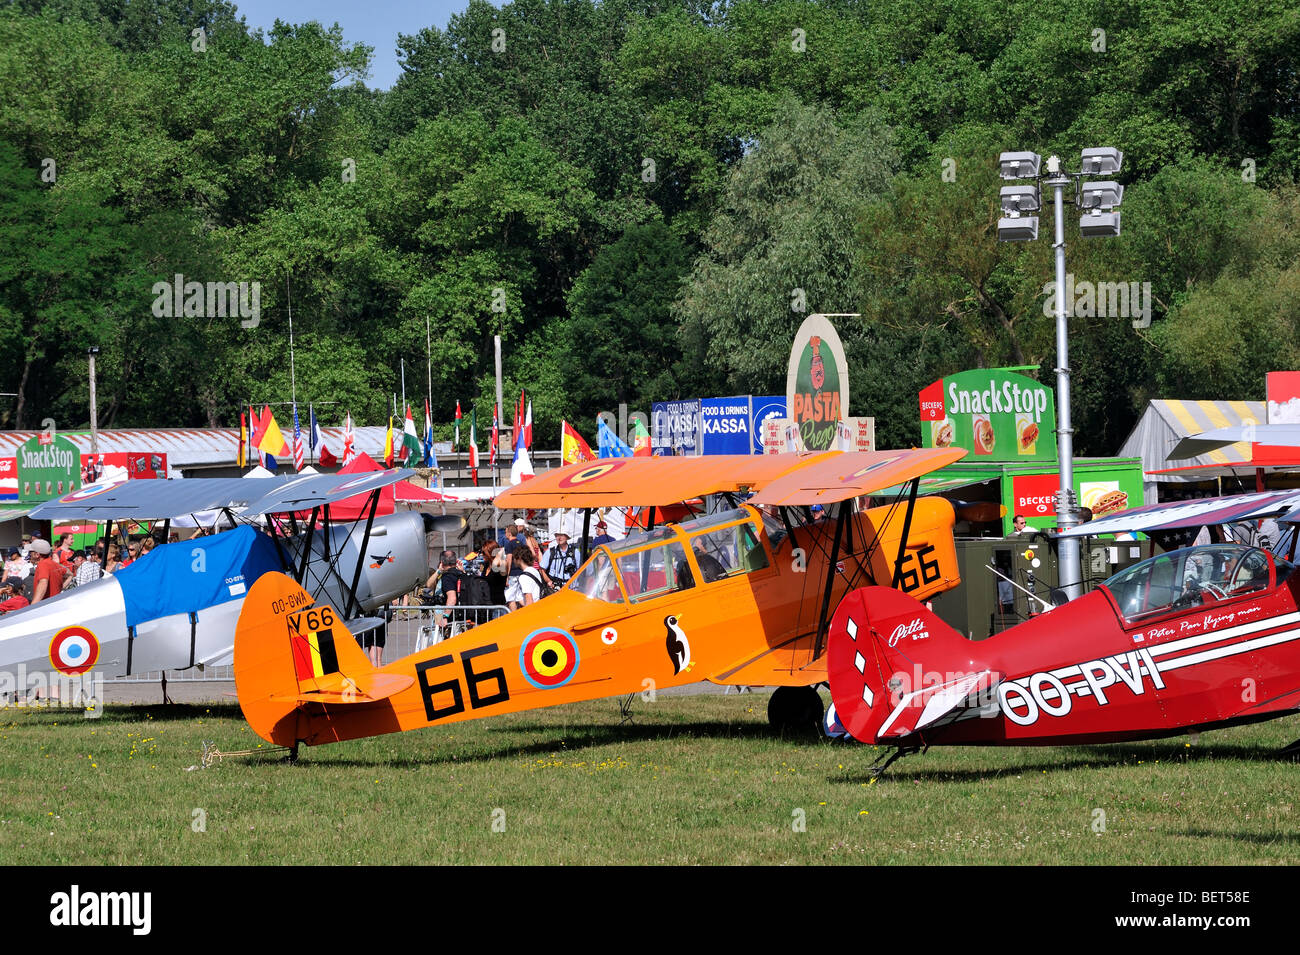 Biplanes at the airshow at Koksijde, Belgium - Stock Image